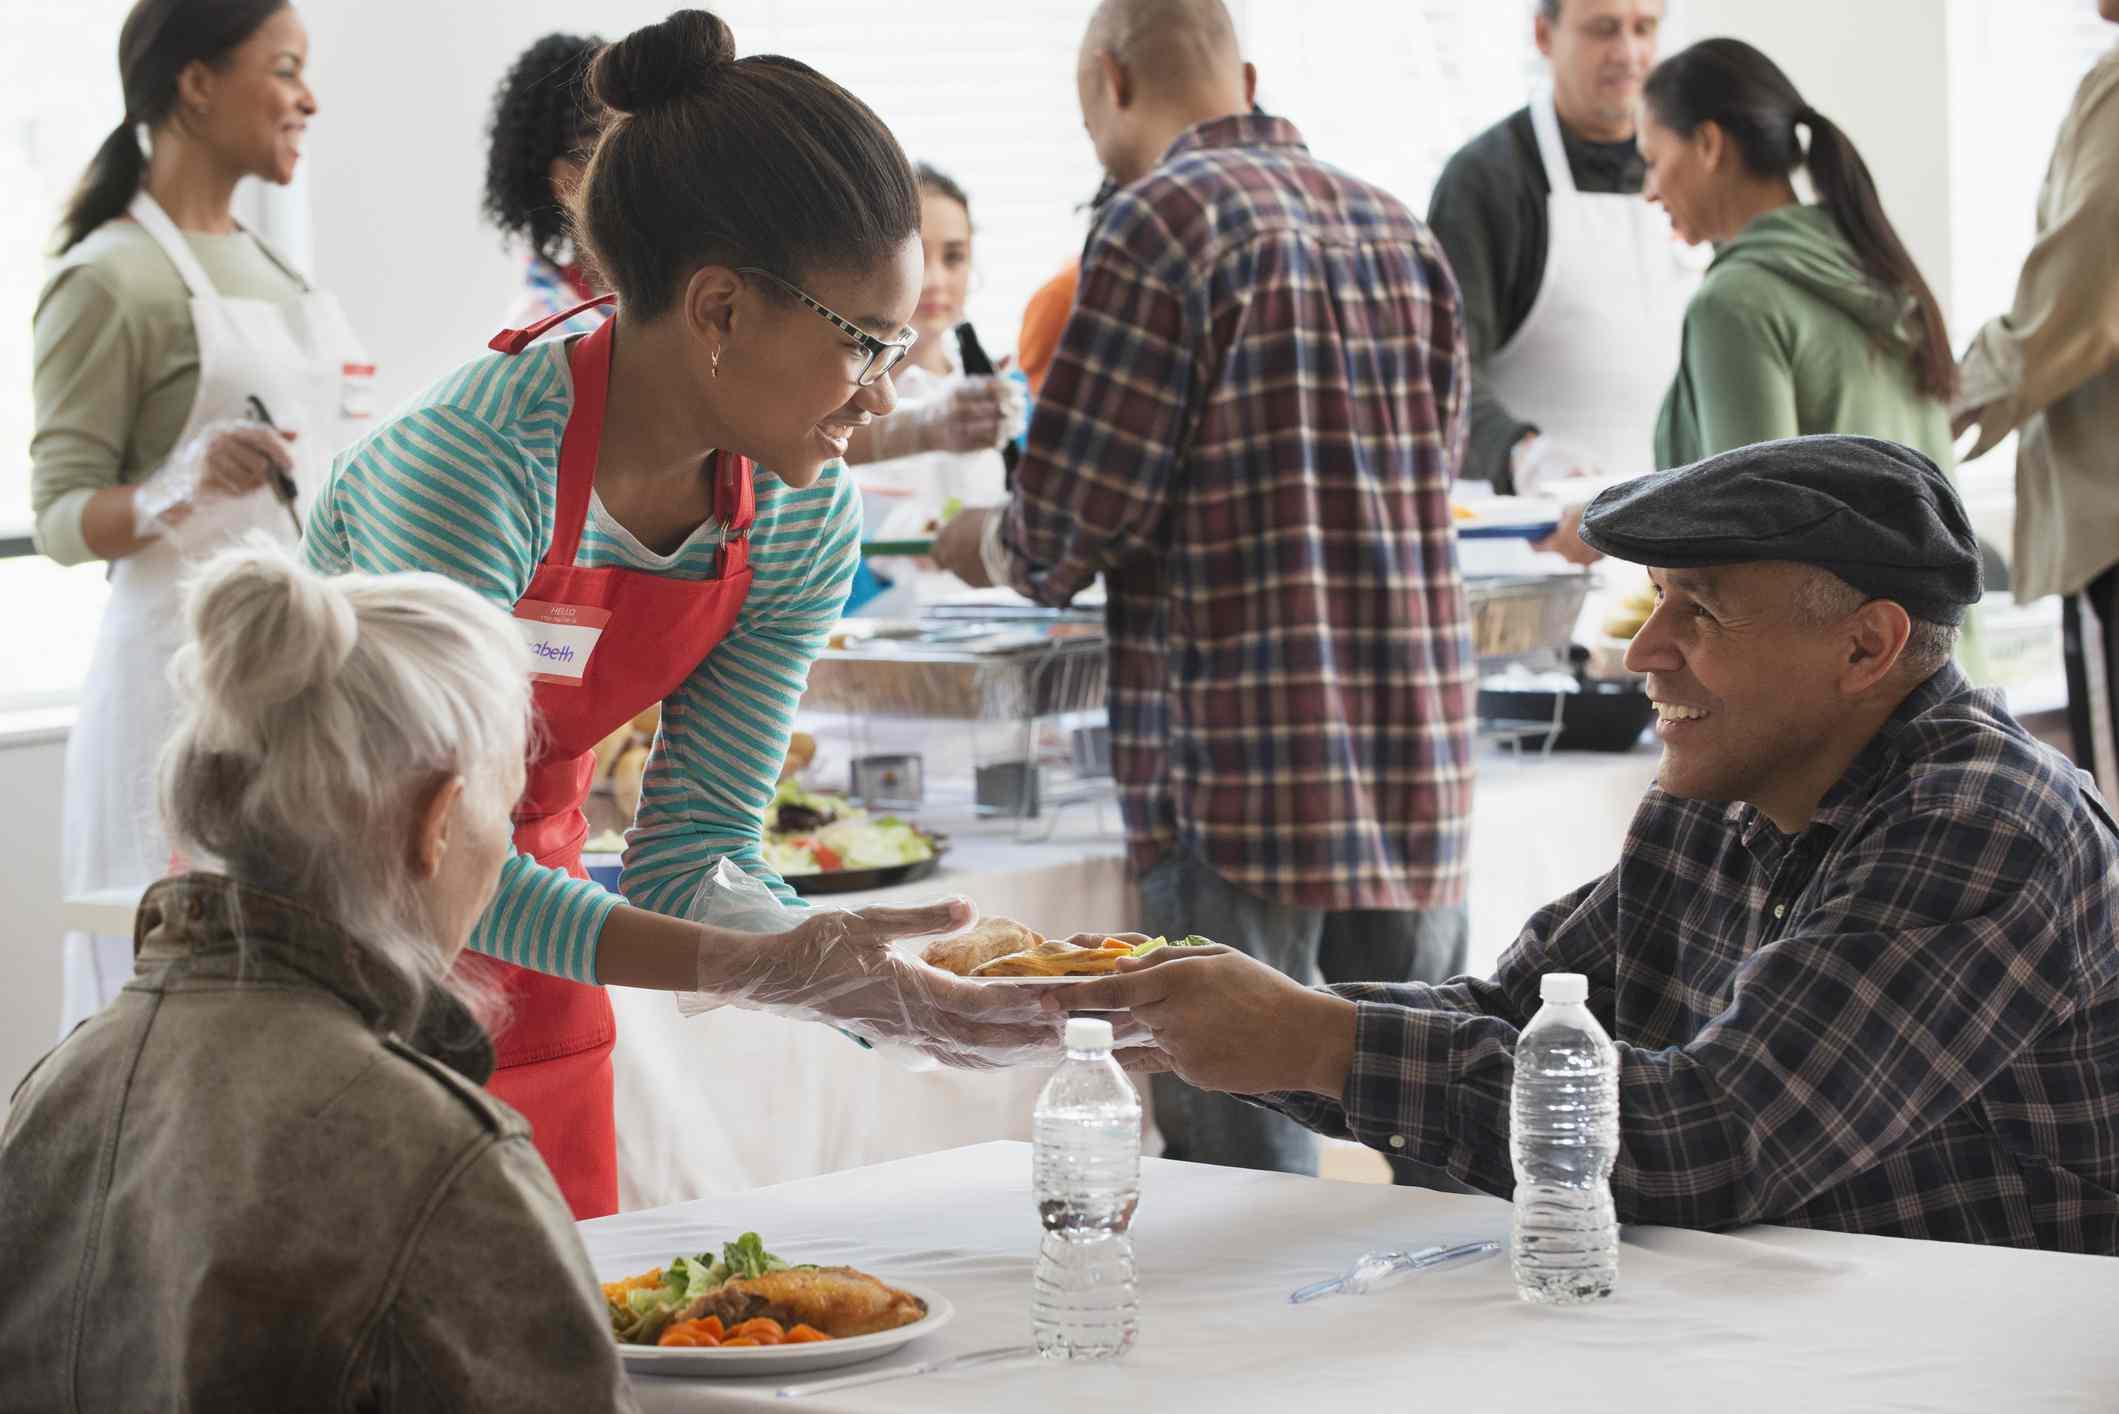 Teen volunteering at a food drive